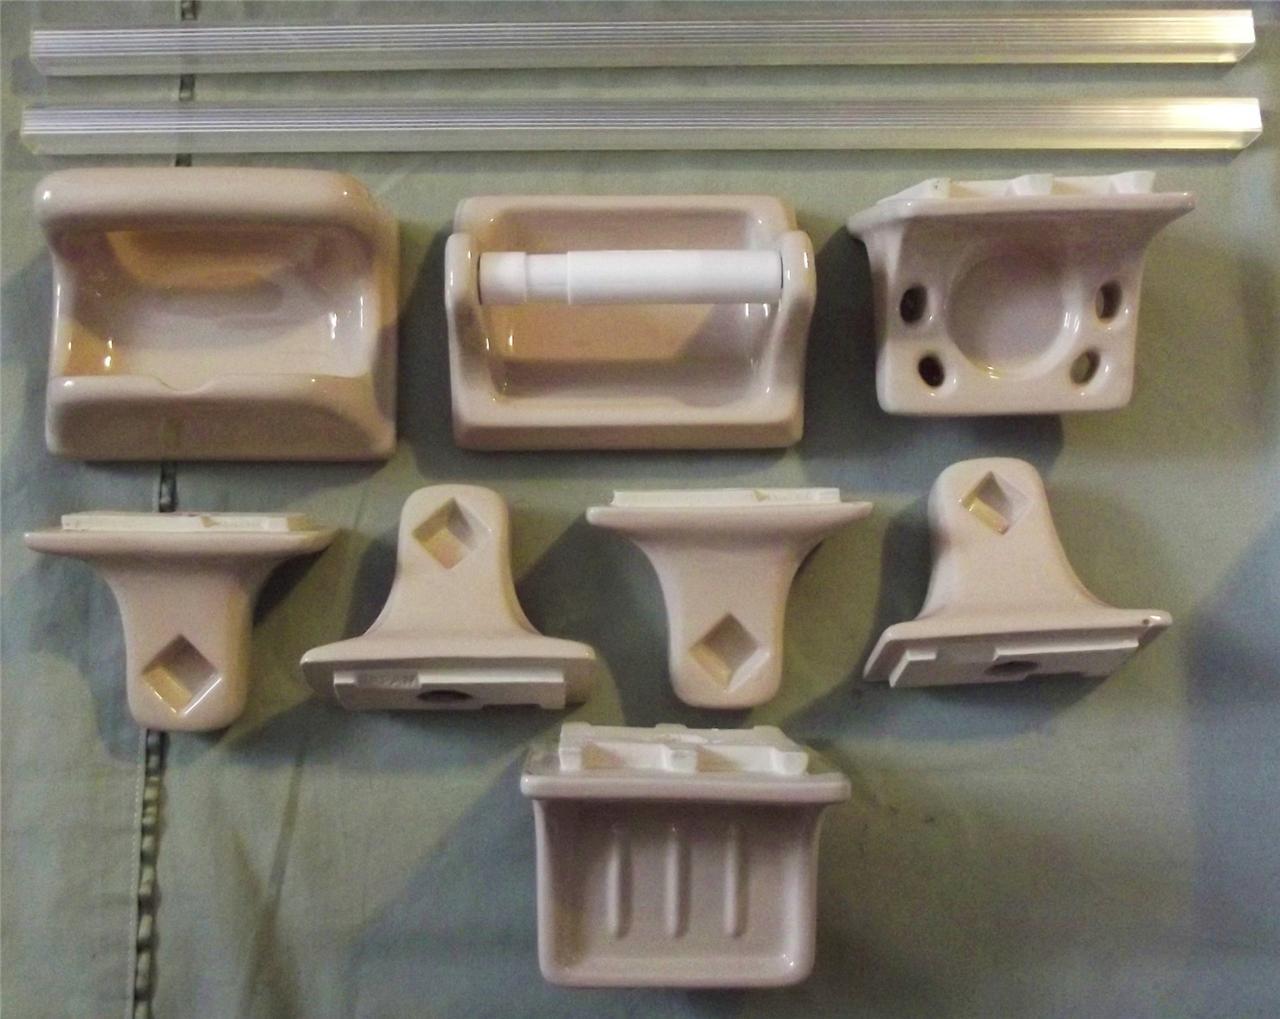 Elegant Fiberglass Ceramic Or Porcelain Choosing Bathroom Fixtures Presented